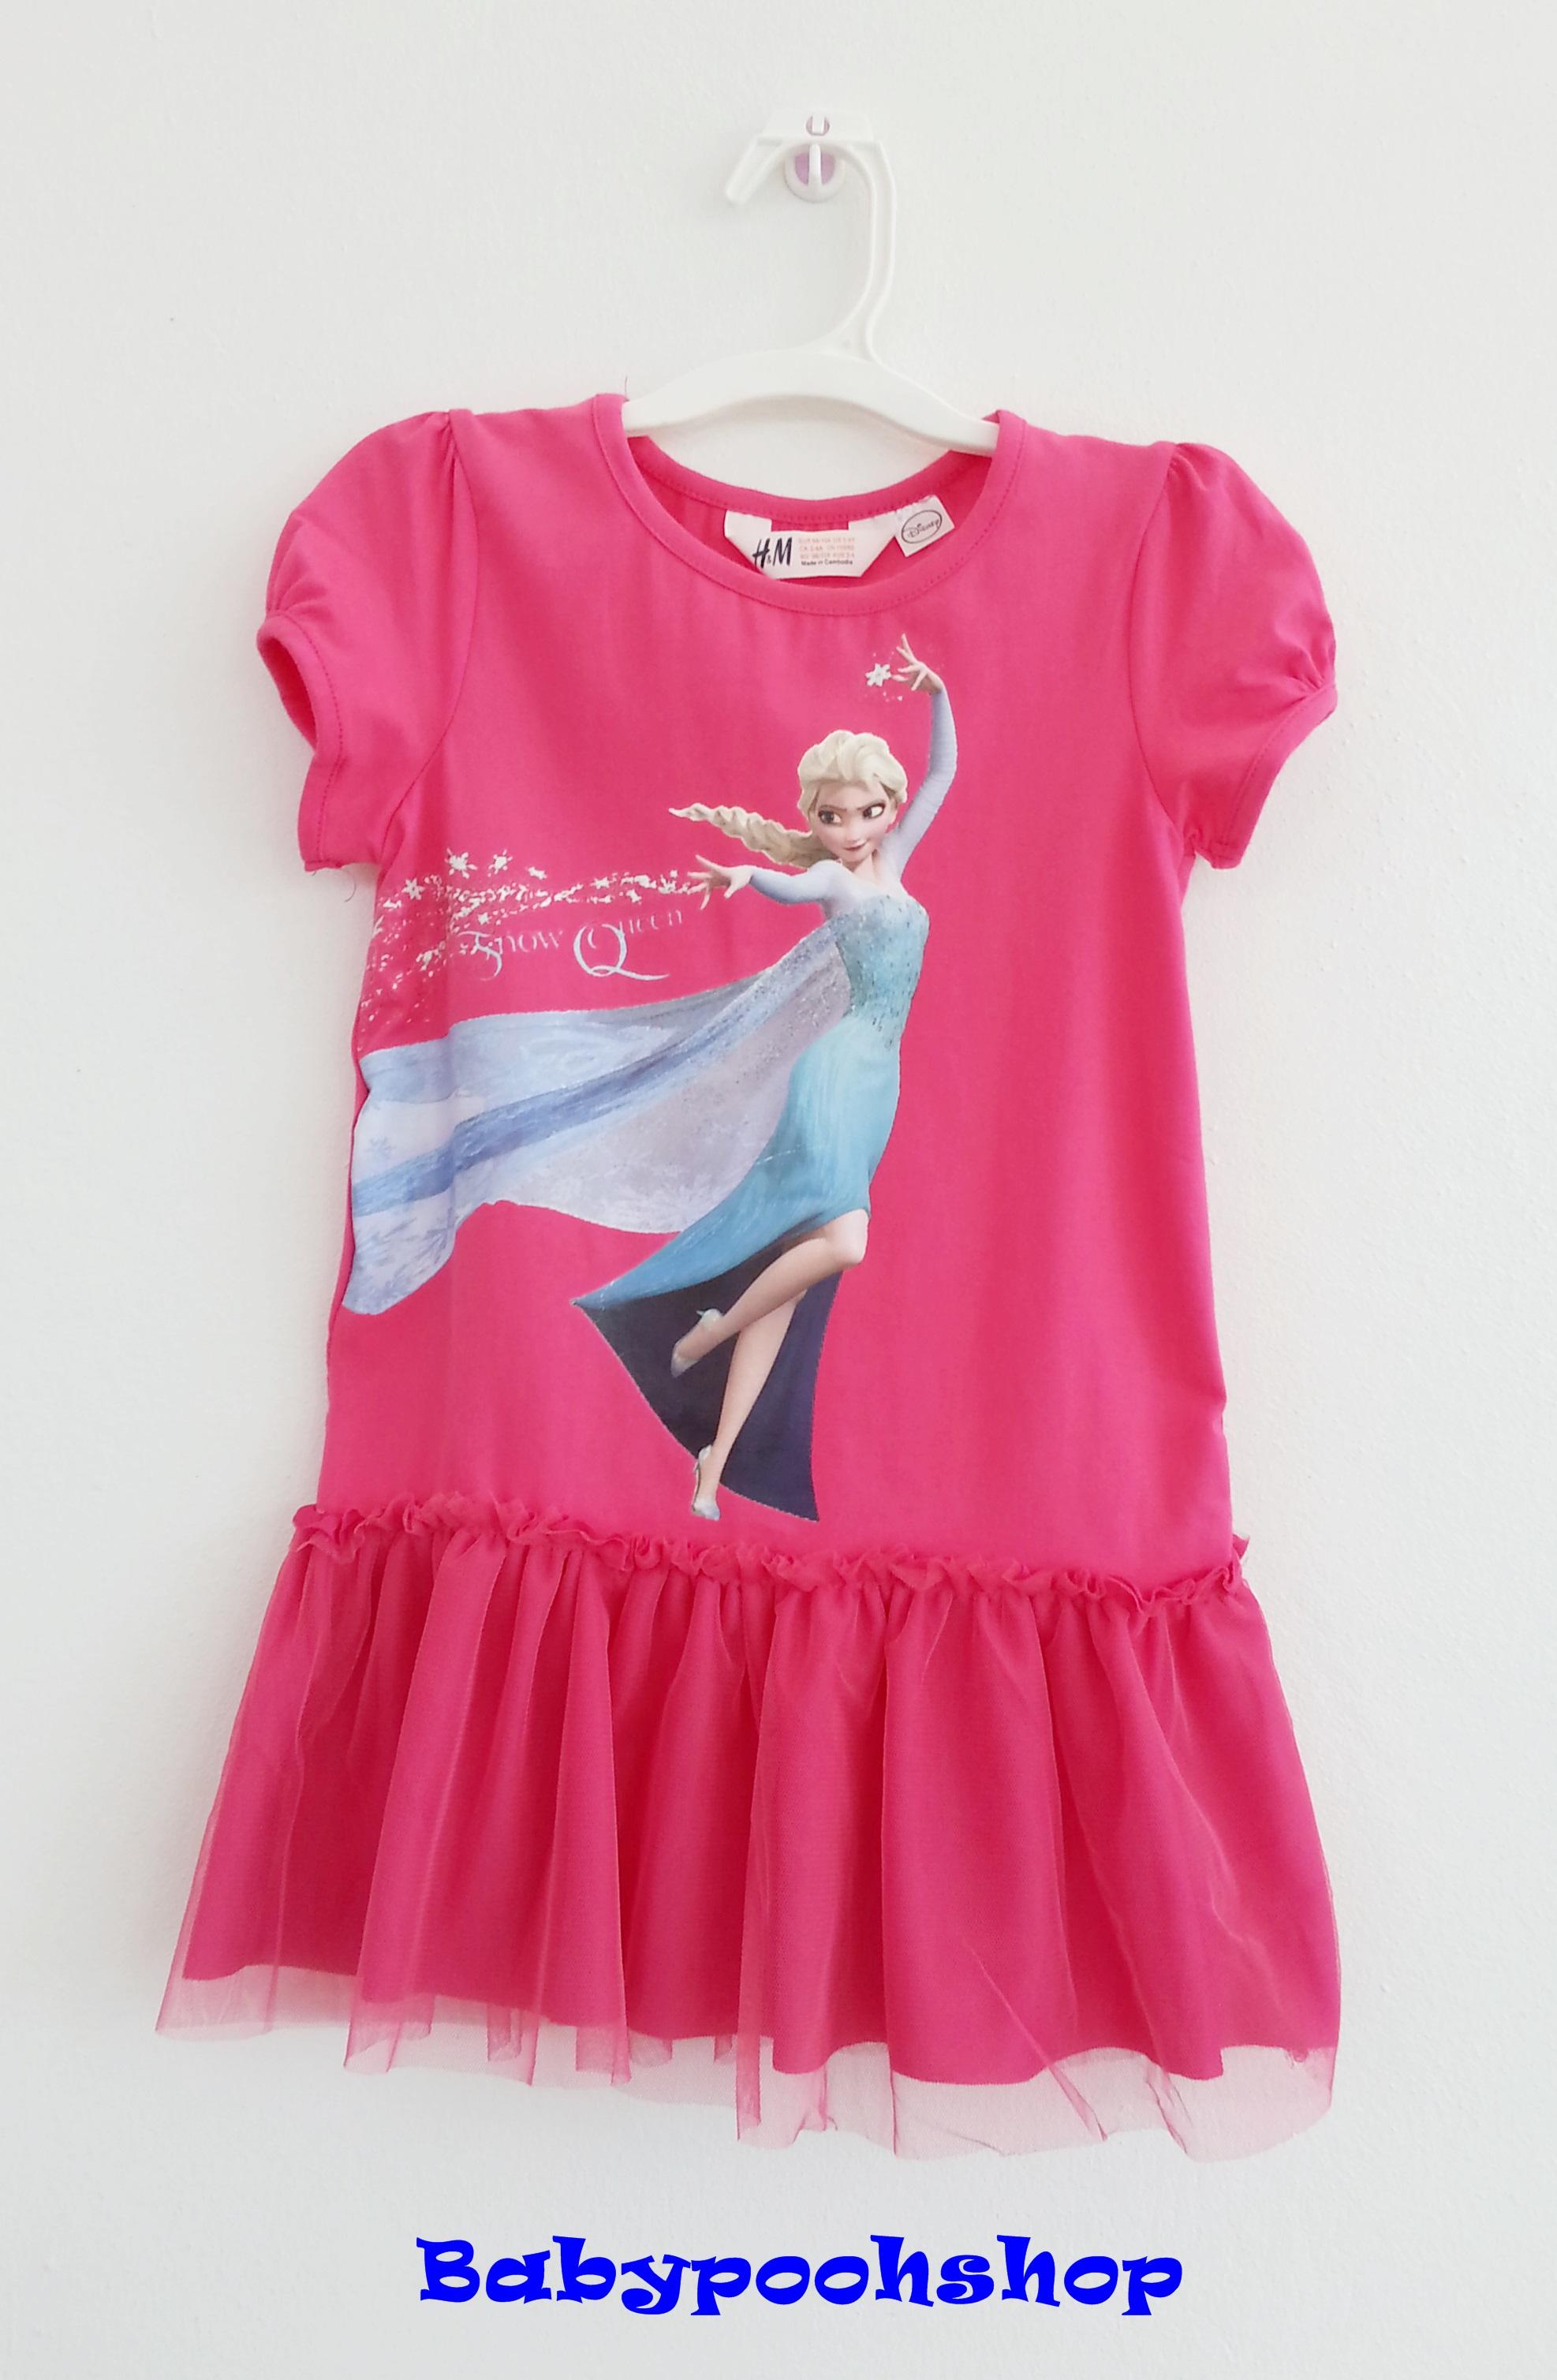 H&M : เดรส สกรีนลาย เจ้าหญิง Elsa กระโปรงระบาย สีชมพูเข้ม size 12-14y